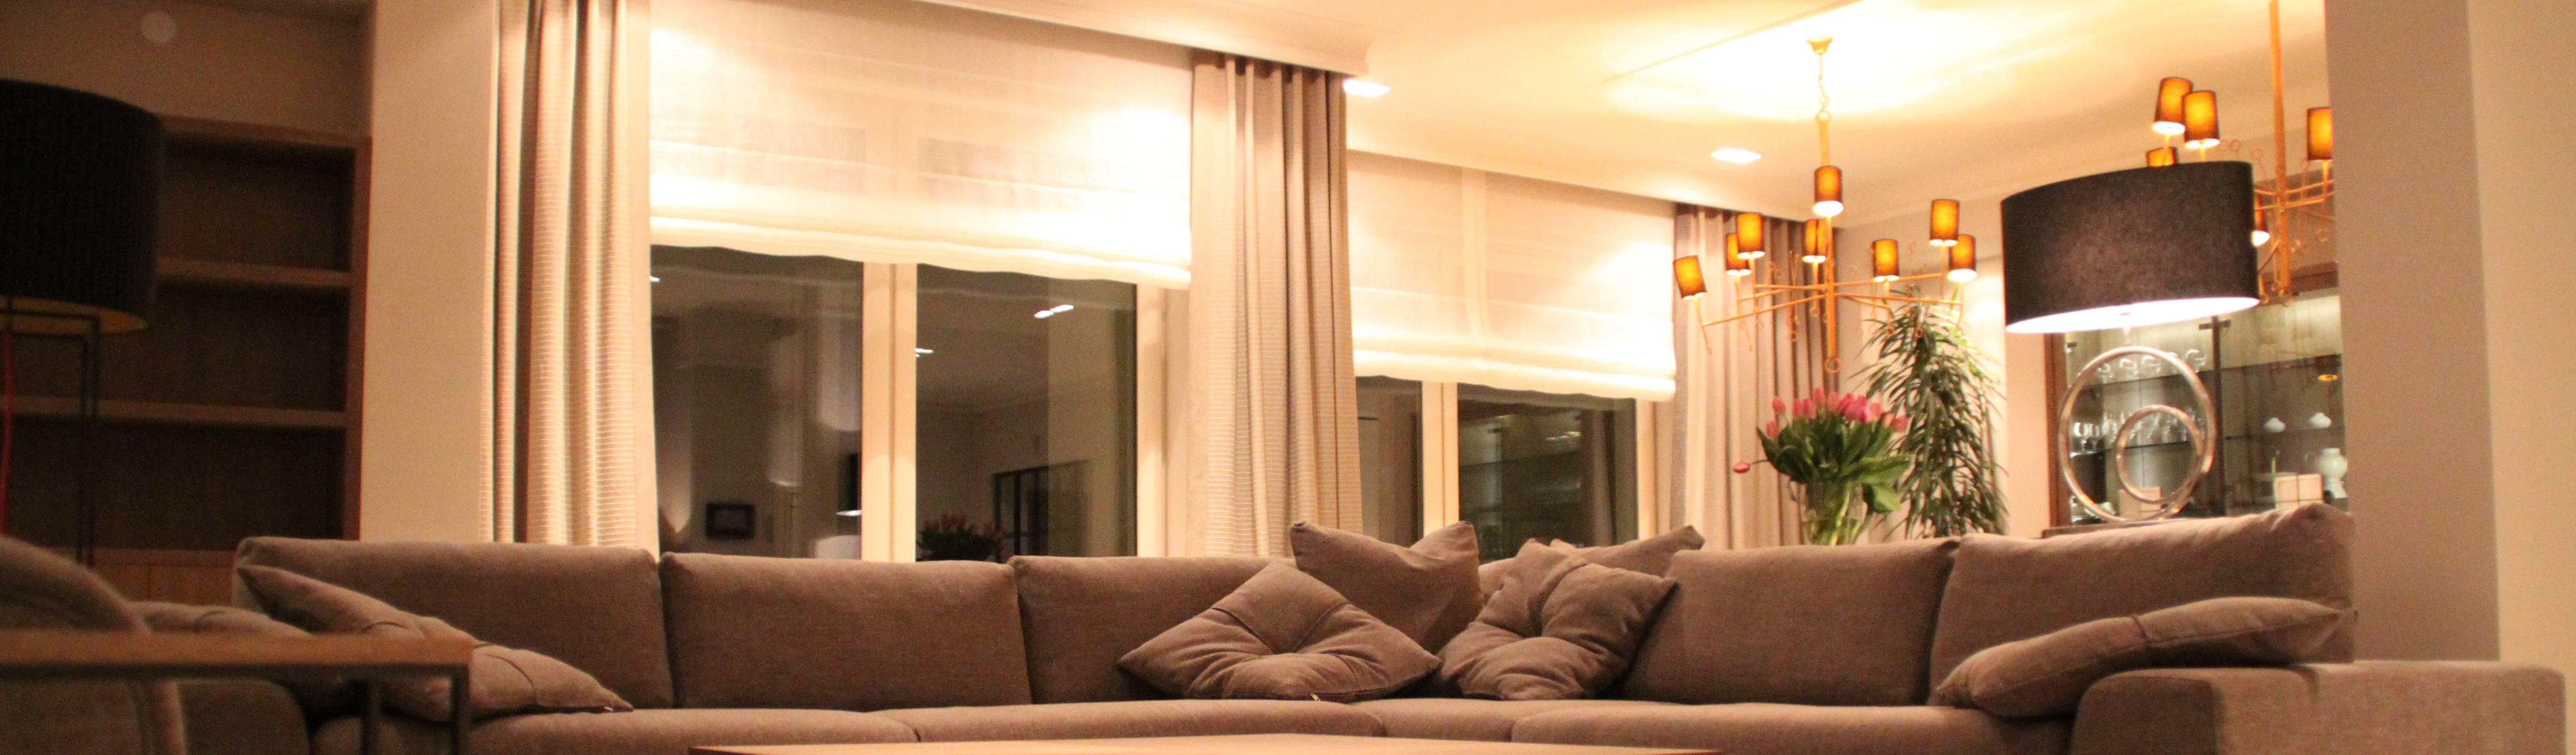 Comfort & Style Interiors